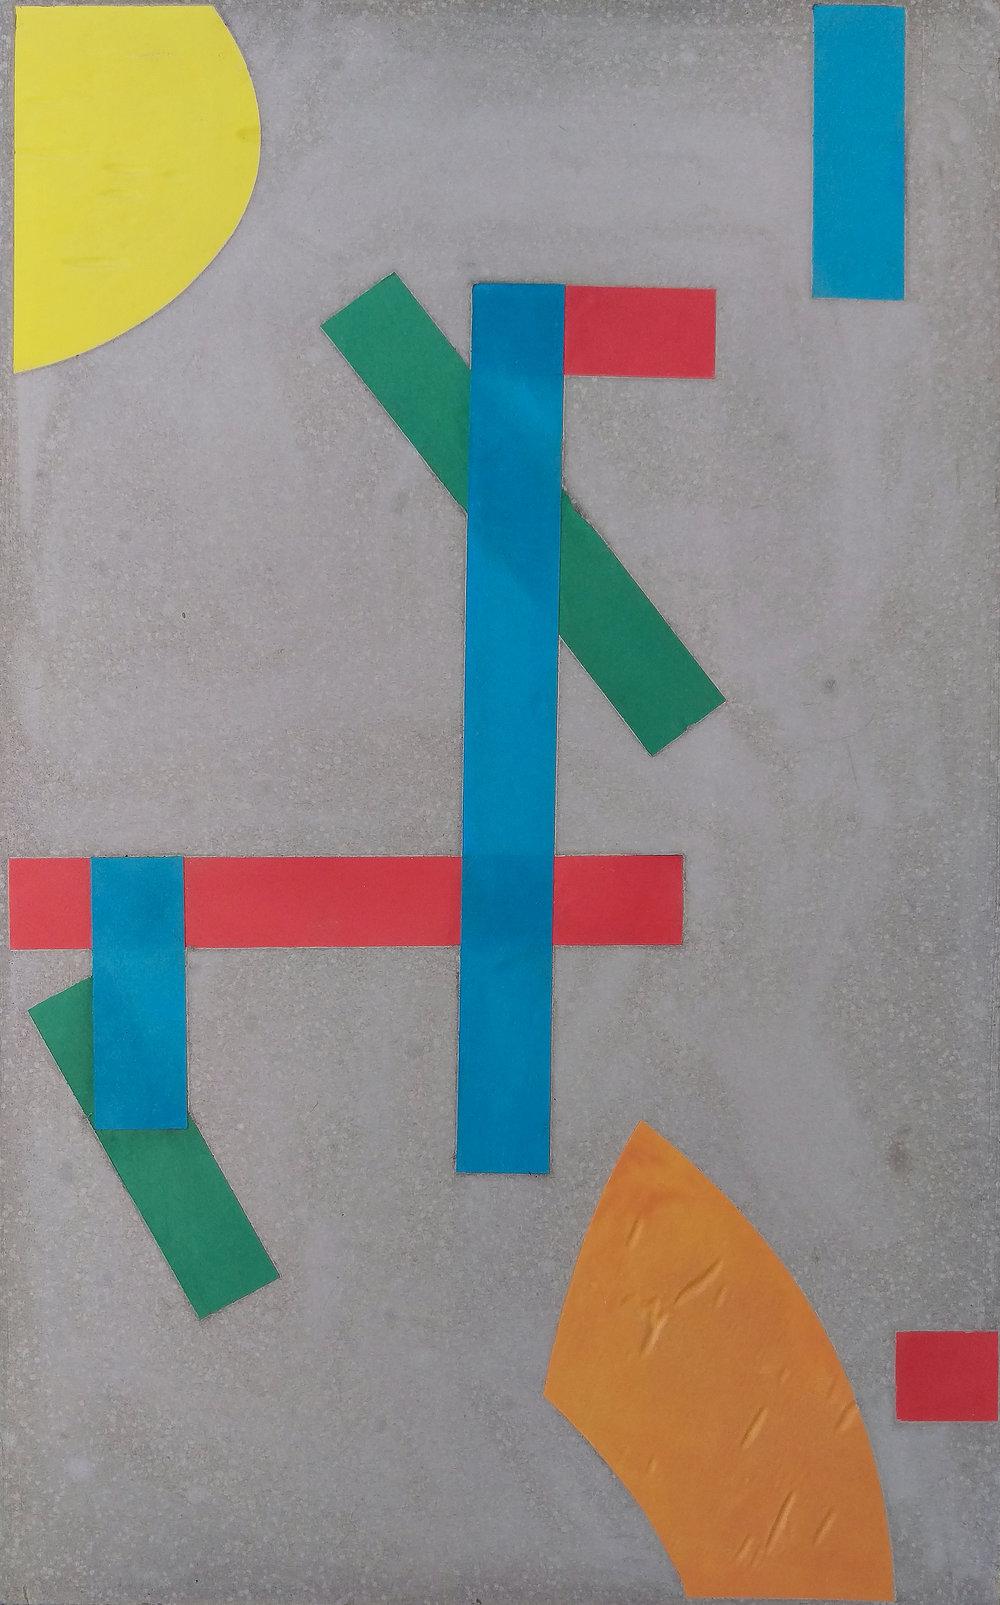 Transcription [dada rhapsody on gray], series, 2014